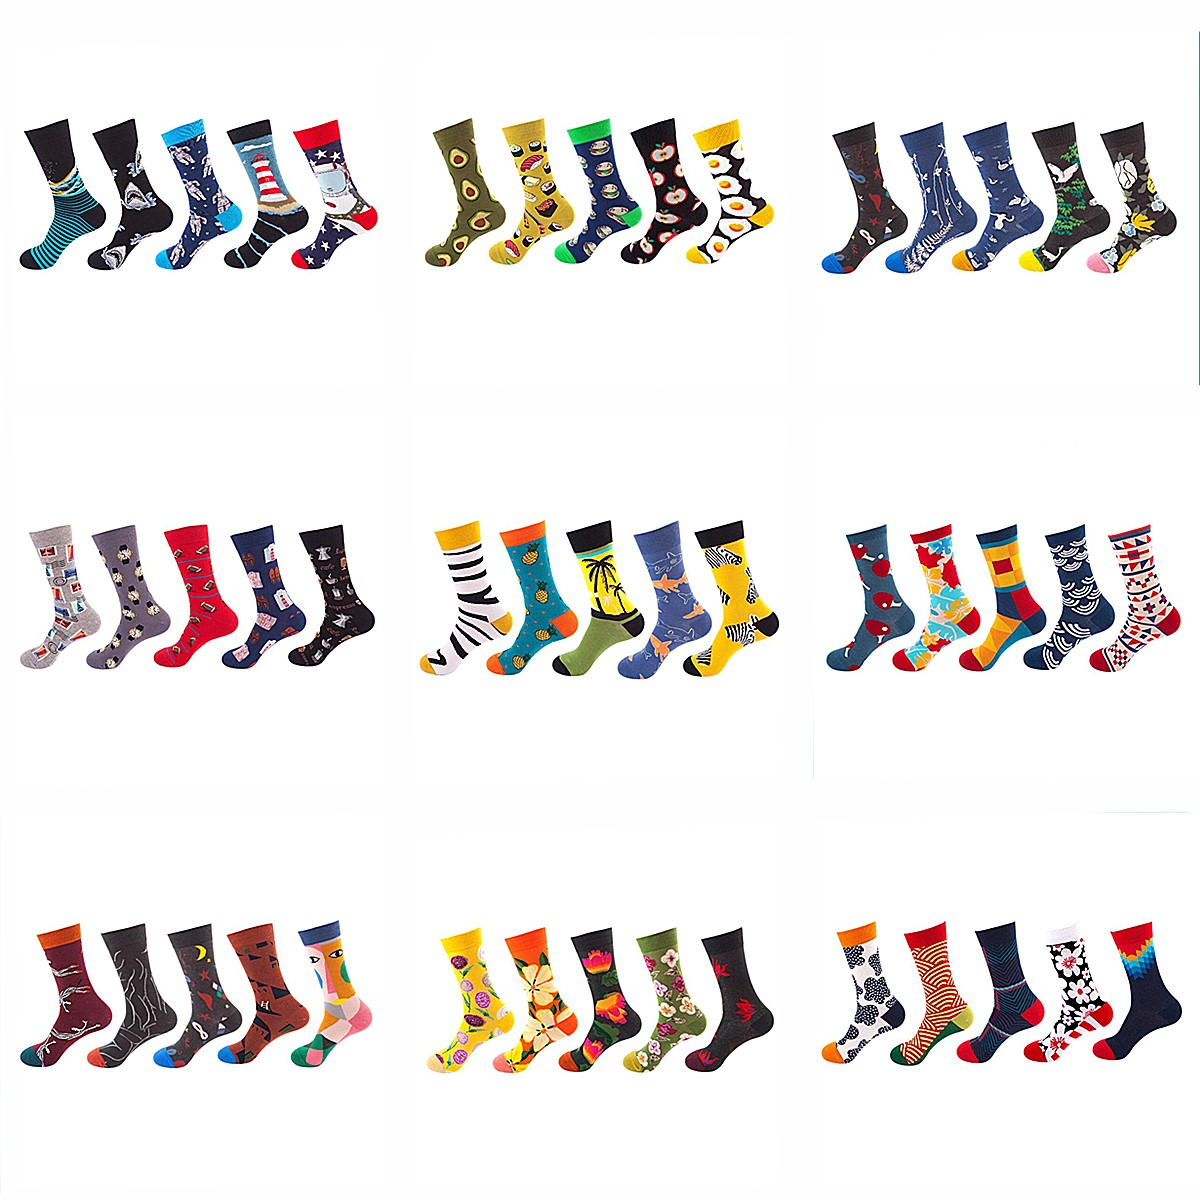 Combed Cotton Men Fashion Trend Crew Socks Funny Shark Plant Animal Art Man Novelty Long Socks Happy Woman Cartoon Socks